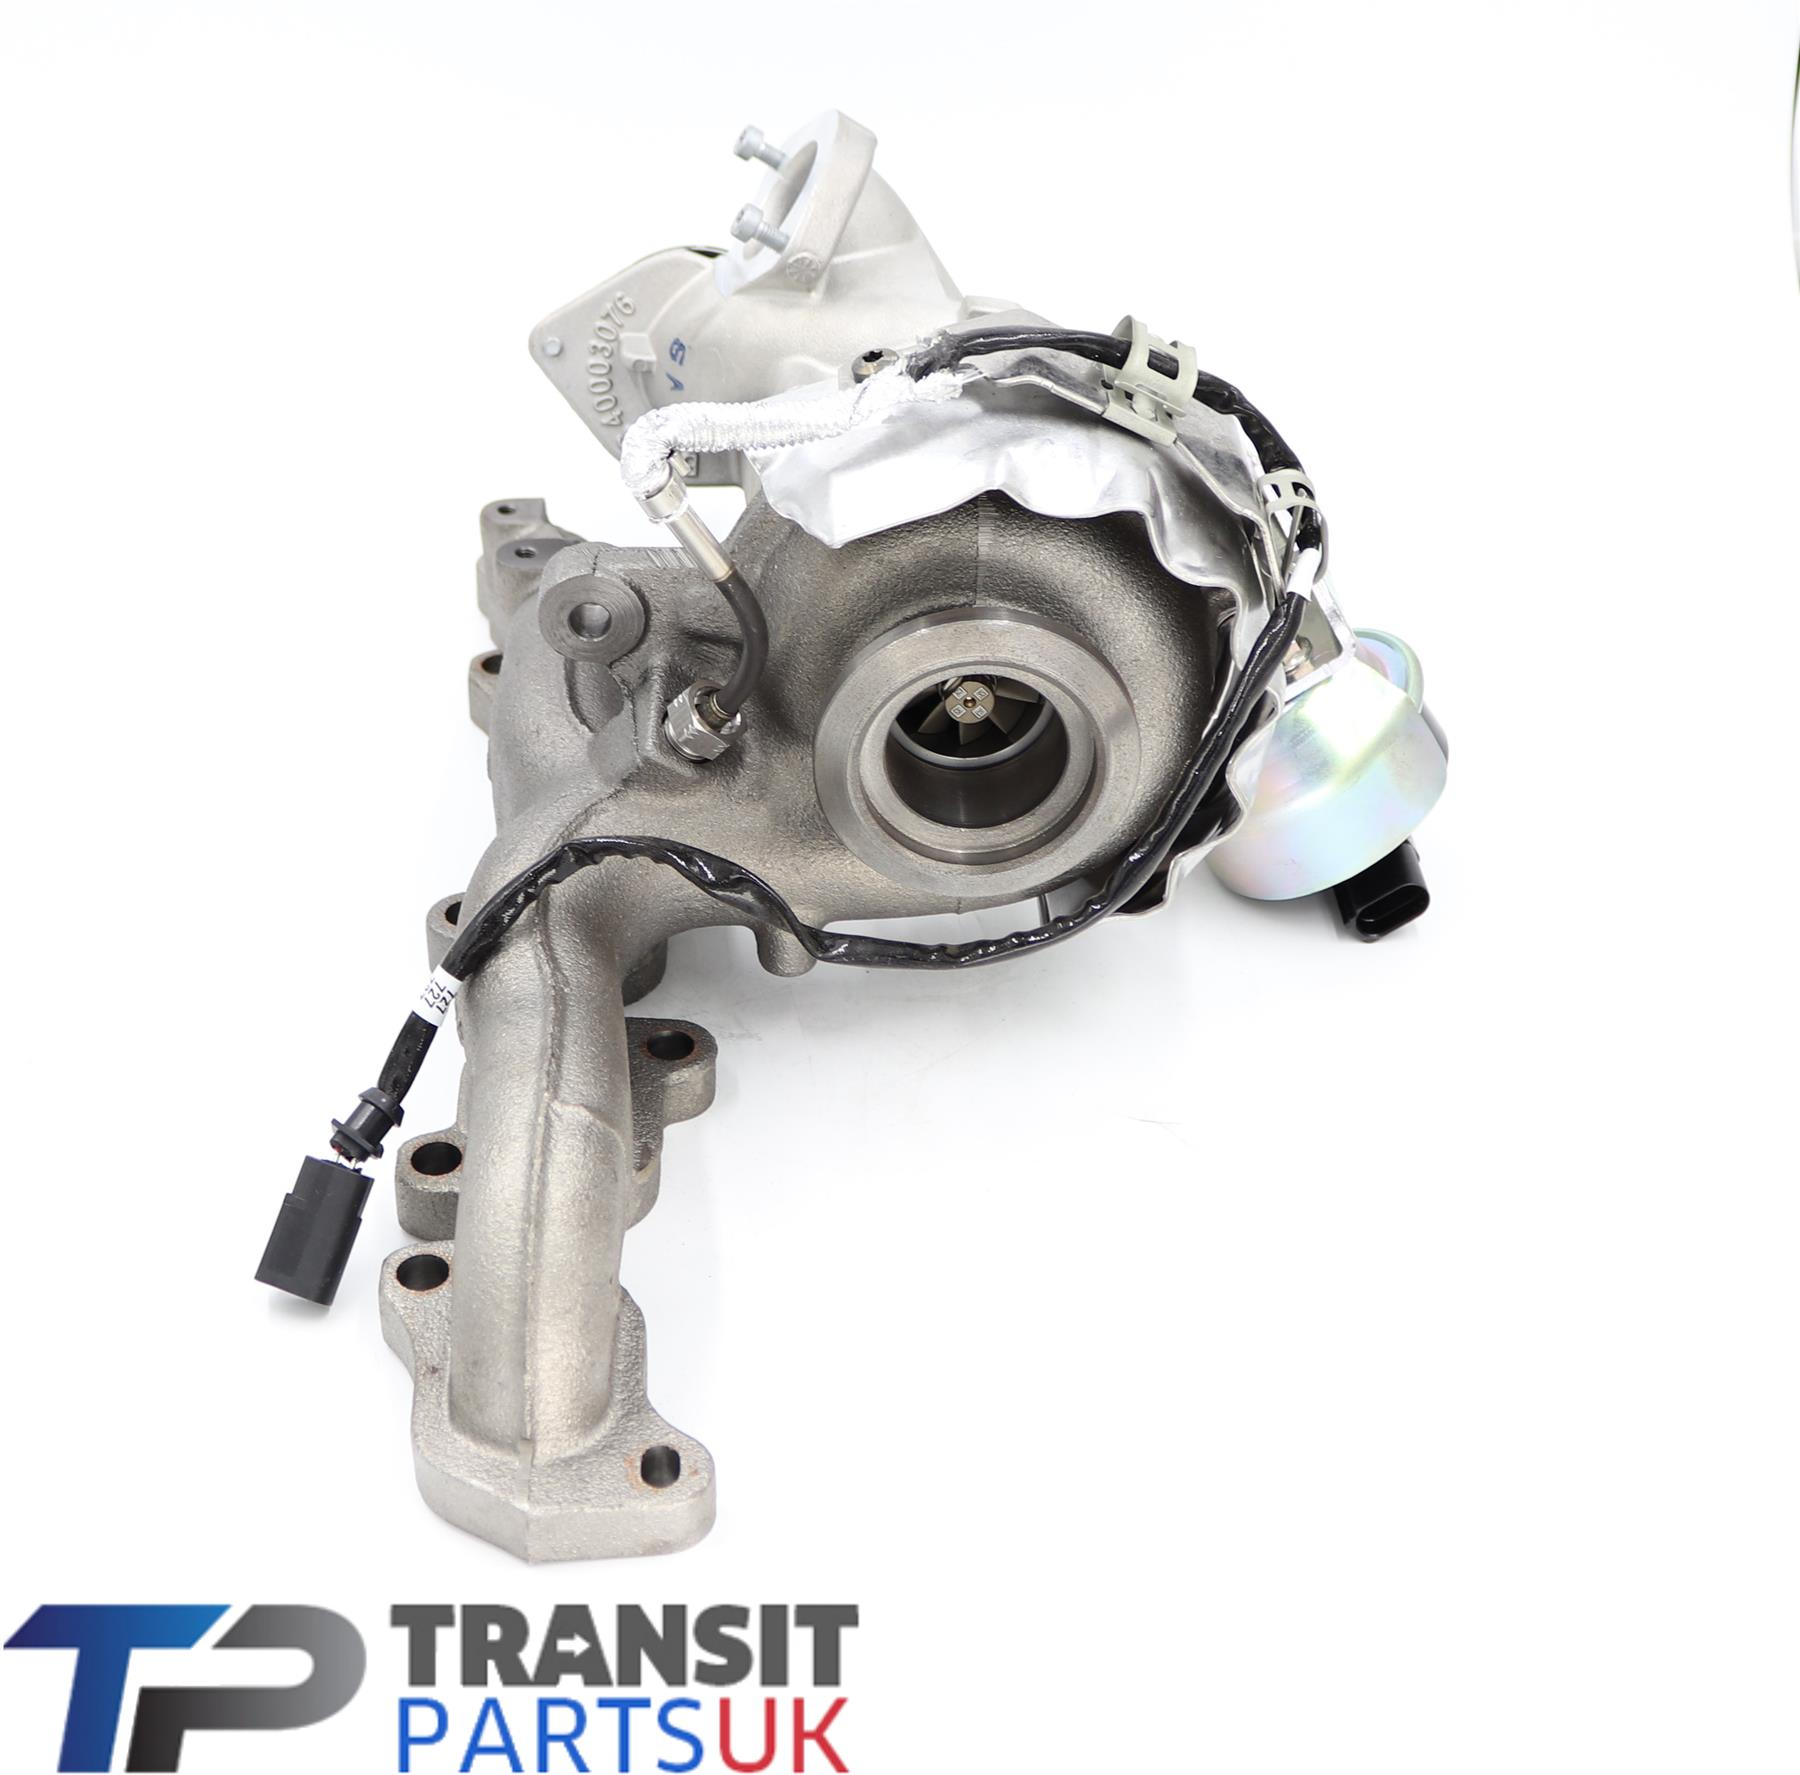 Turbo diesel llavero-turbocompresor TDI motor diesel VW injection